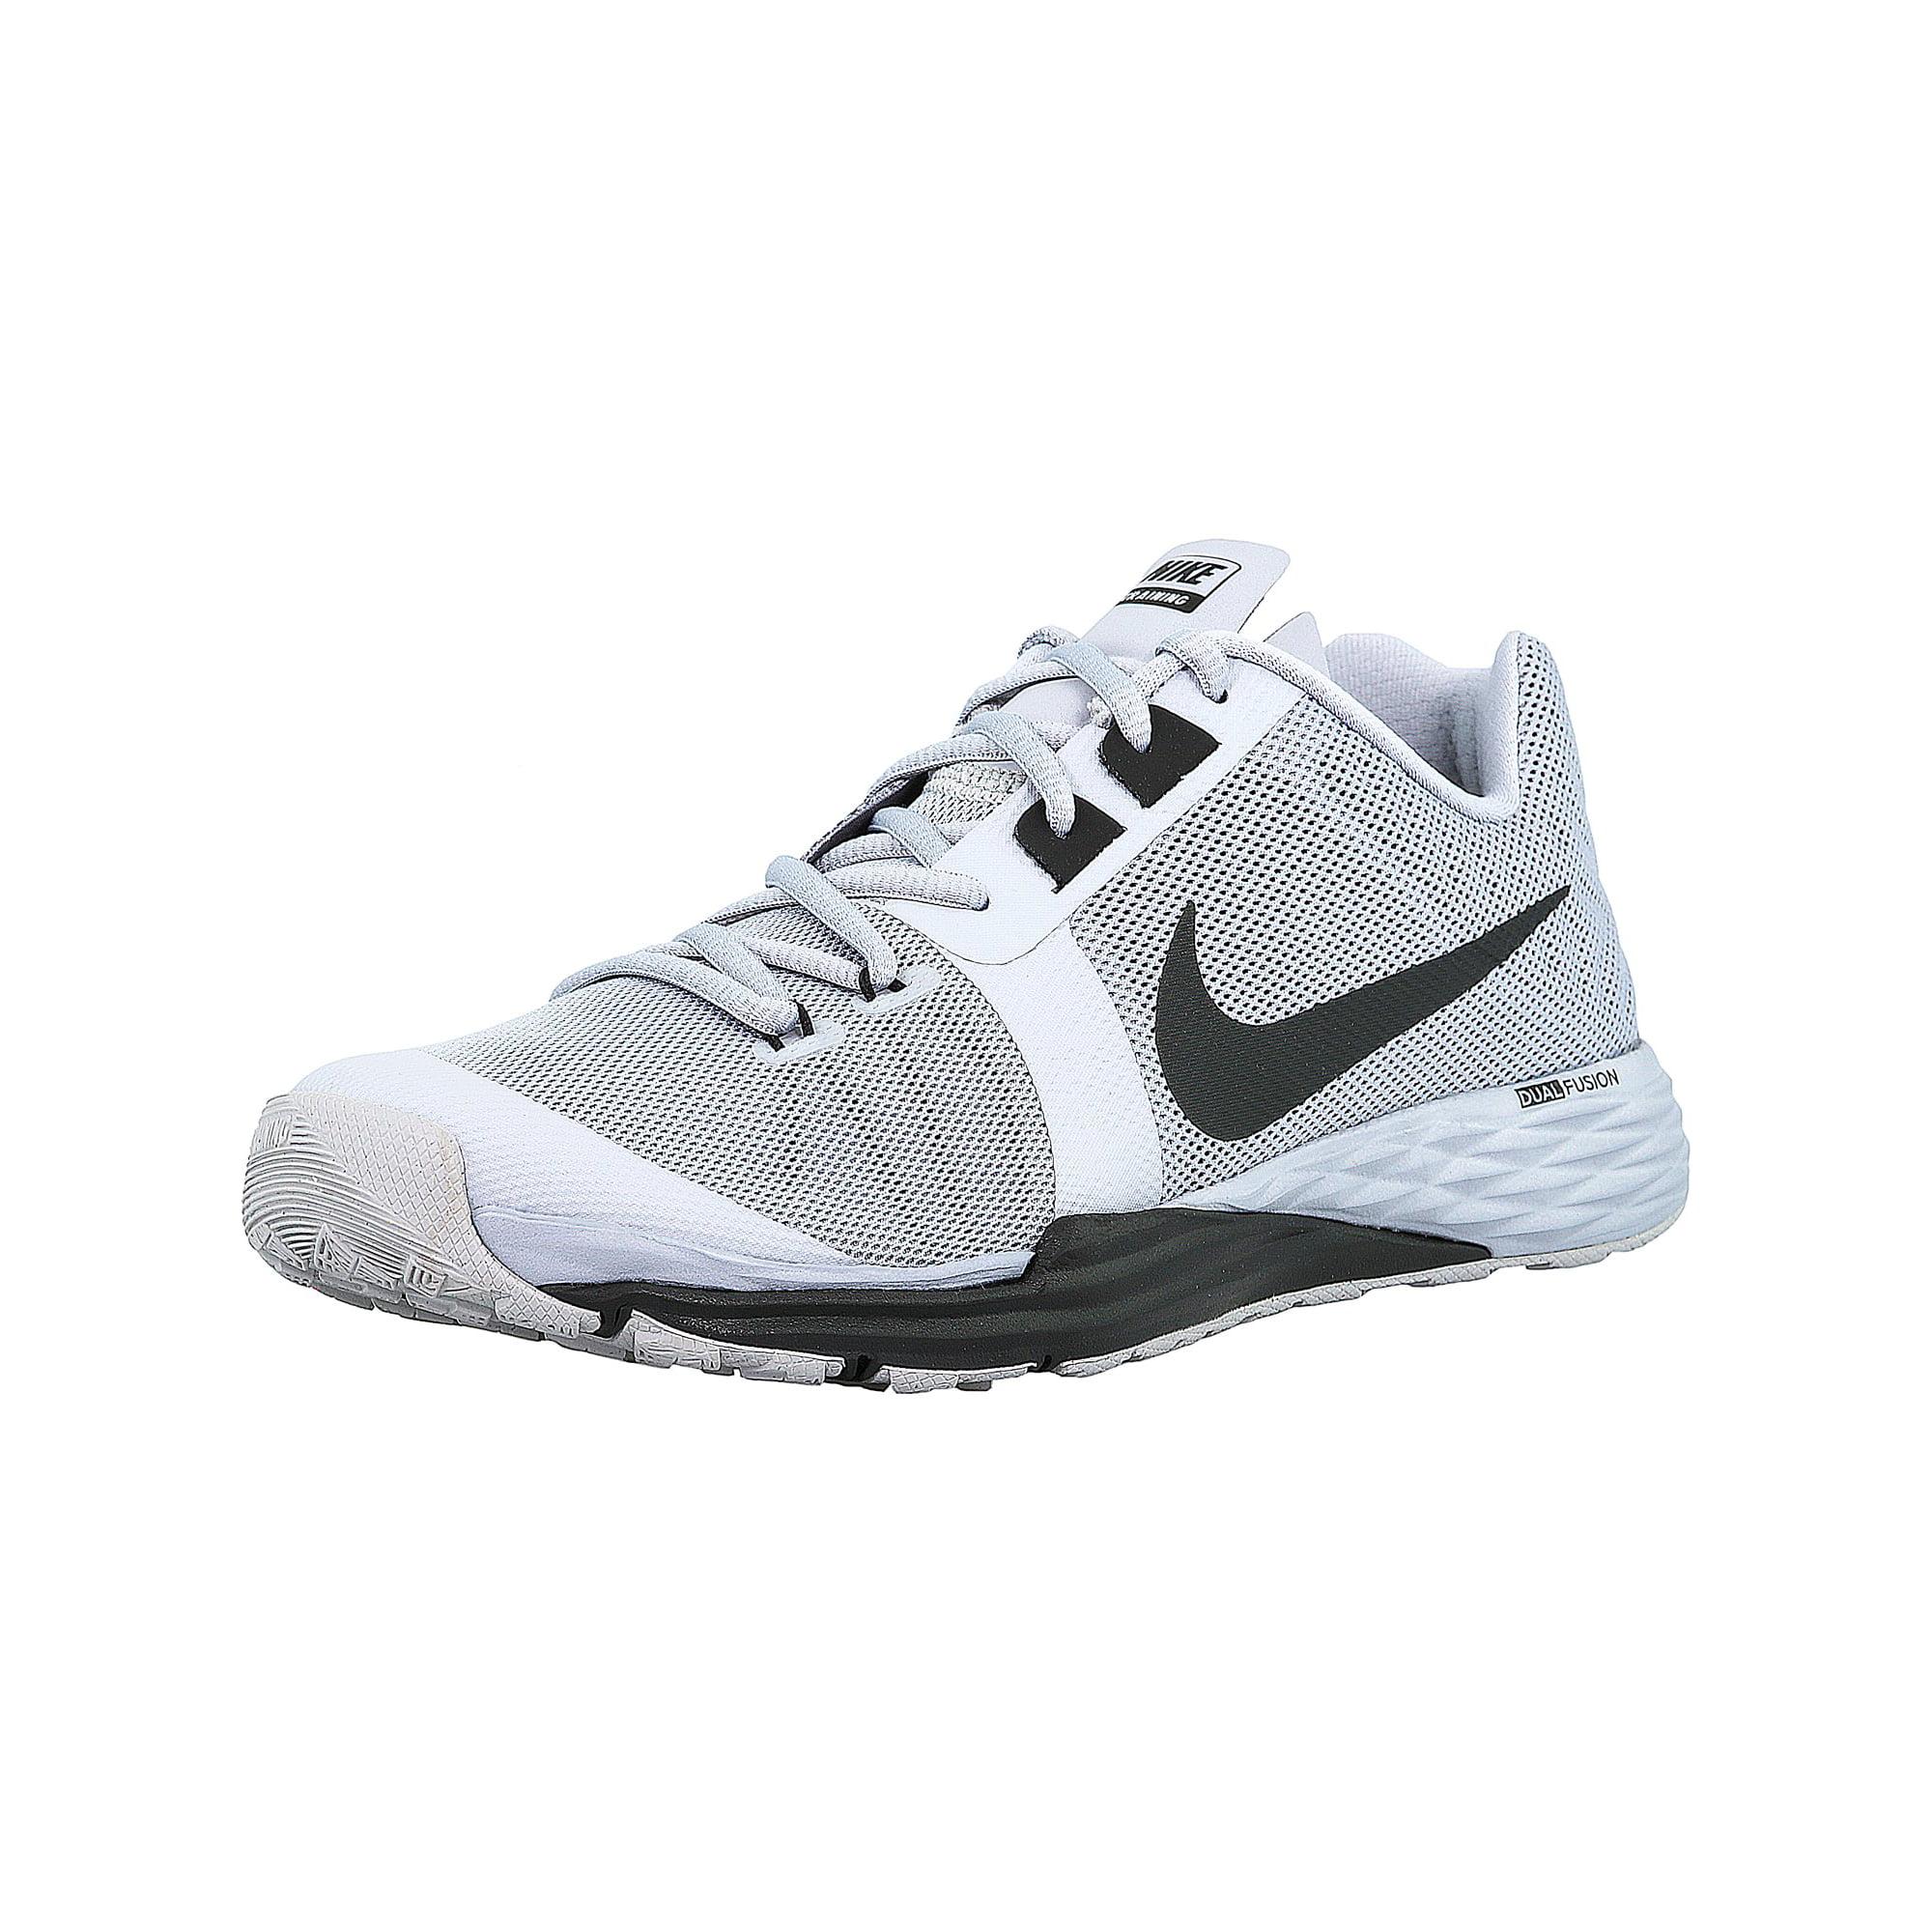 best website 4734c 1146b Nike Men s Train Prime Iron Df Cool Grey   White - Black Ankle-High Cross Trainer  Shoe 10.5M   Walmart Canada